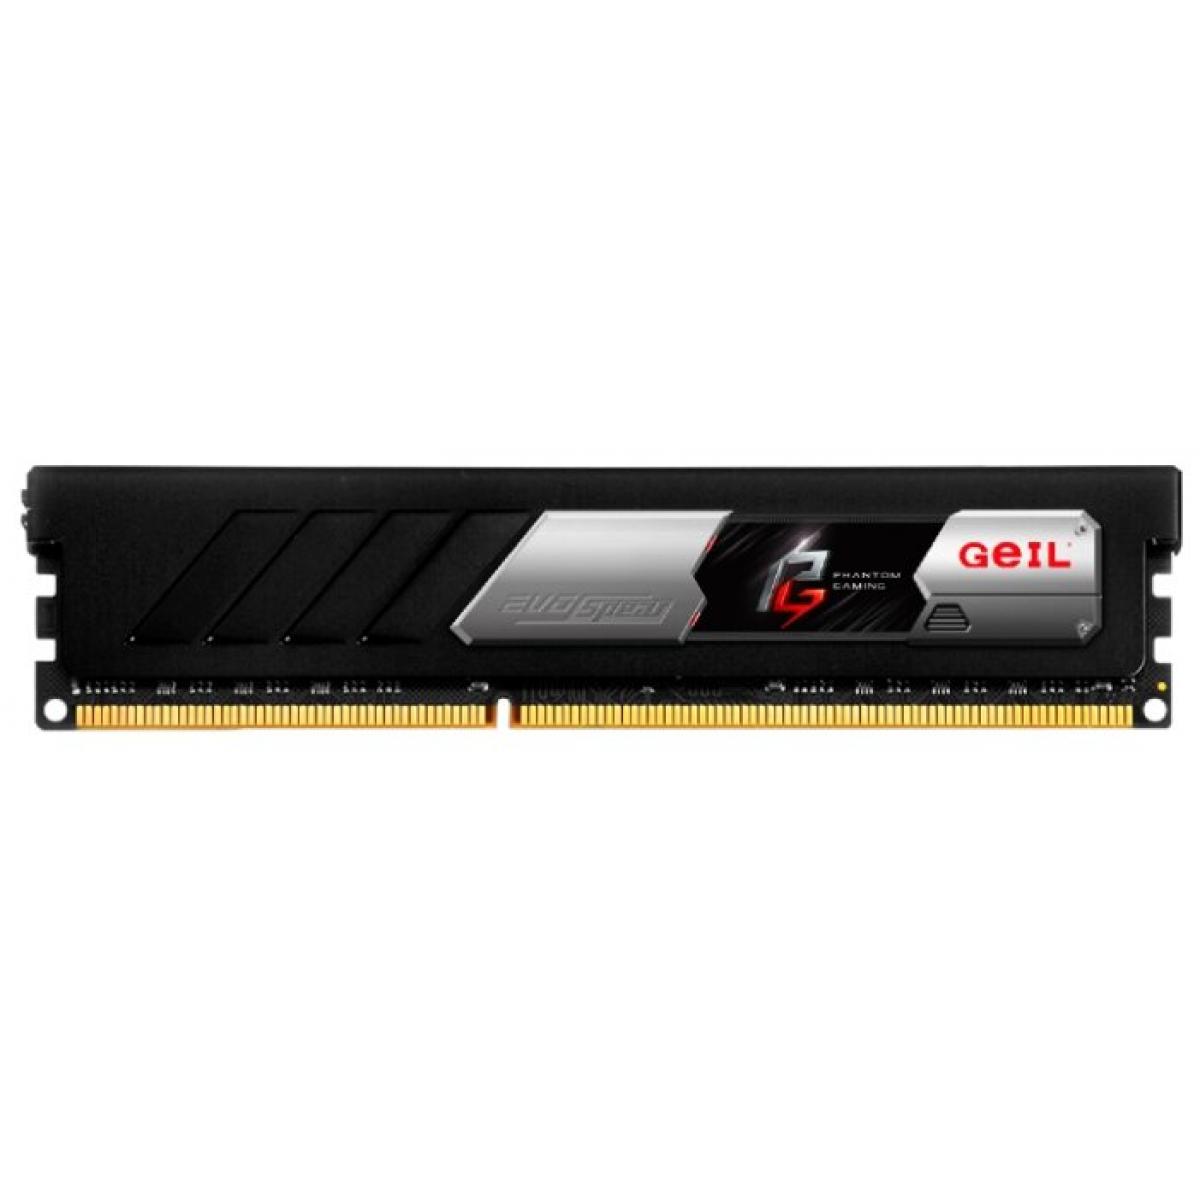 Memória DDR4 Geil Evo Phantom Gaming, 16GB (2X8GB) 3200MHz, Black, GASF416GB3200C16ADC